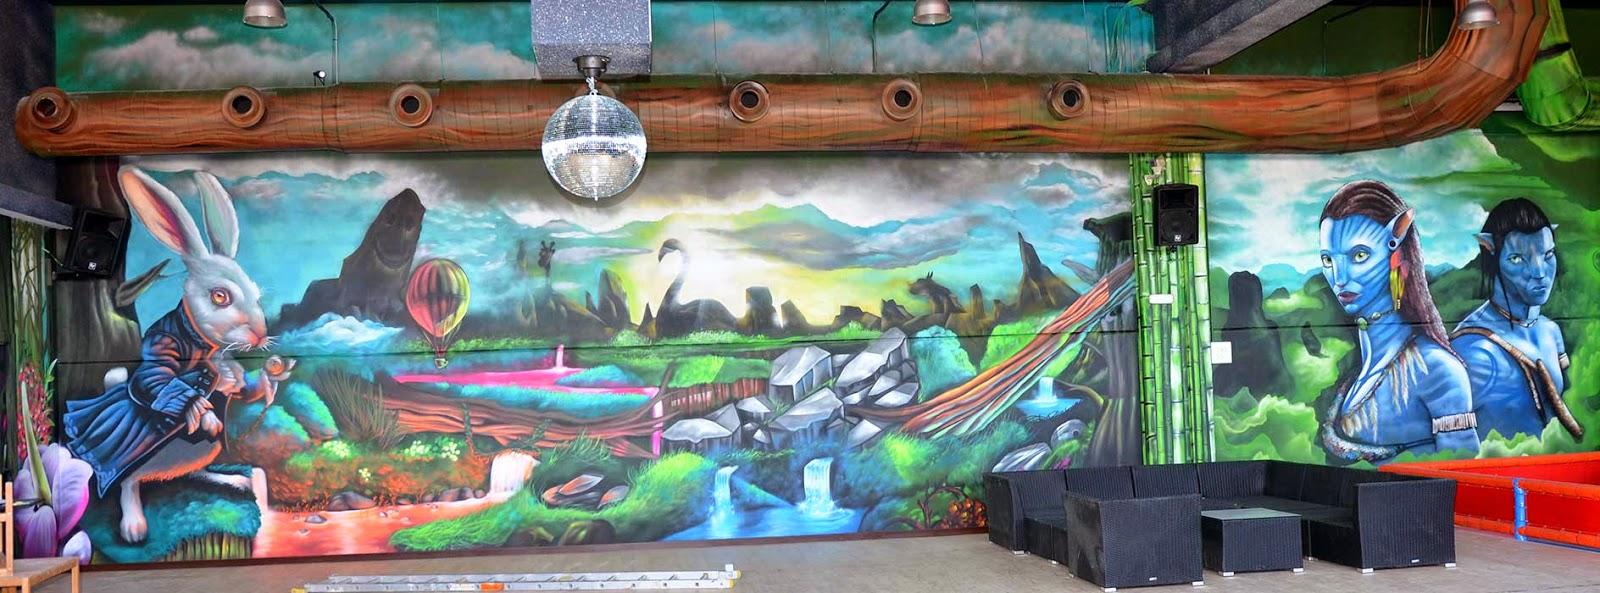 Berok Graffiti mural profesional en Barcelona abril 2014